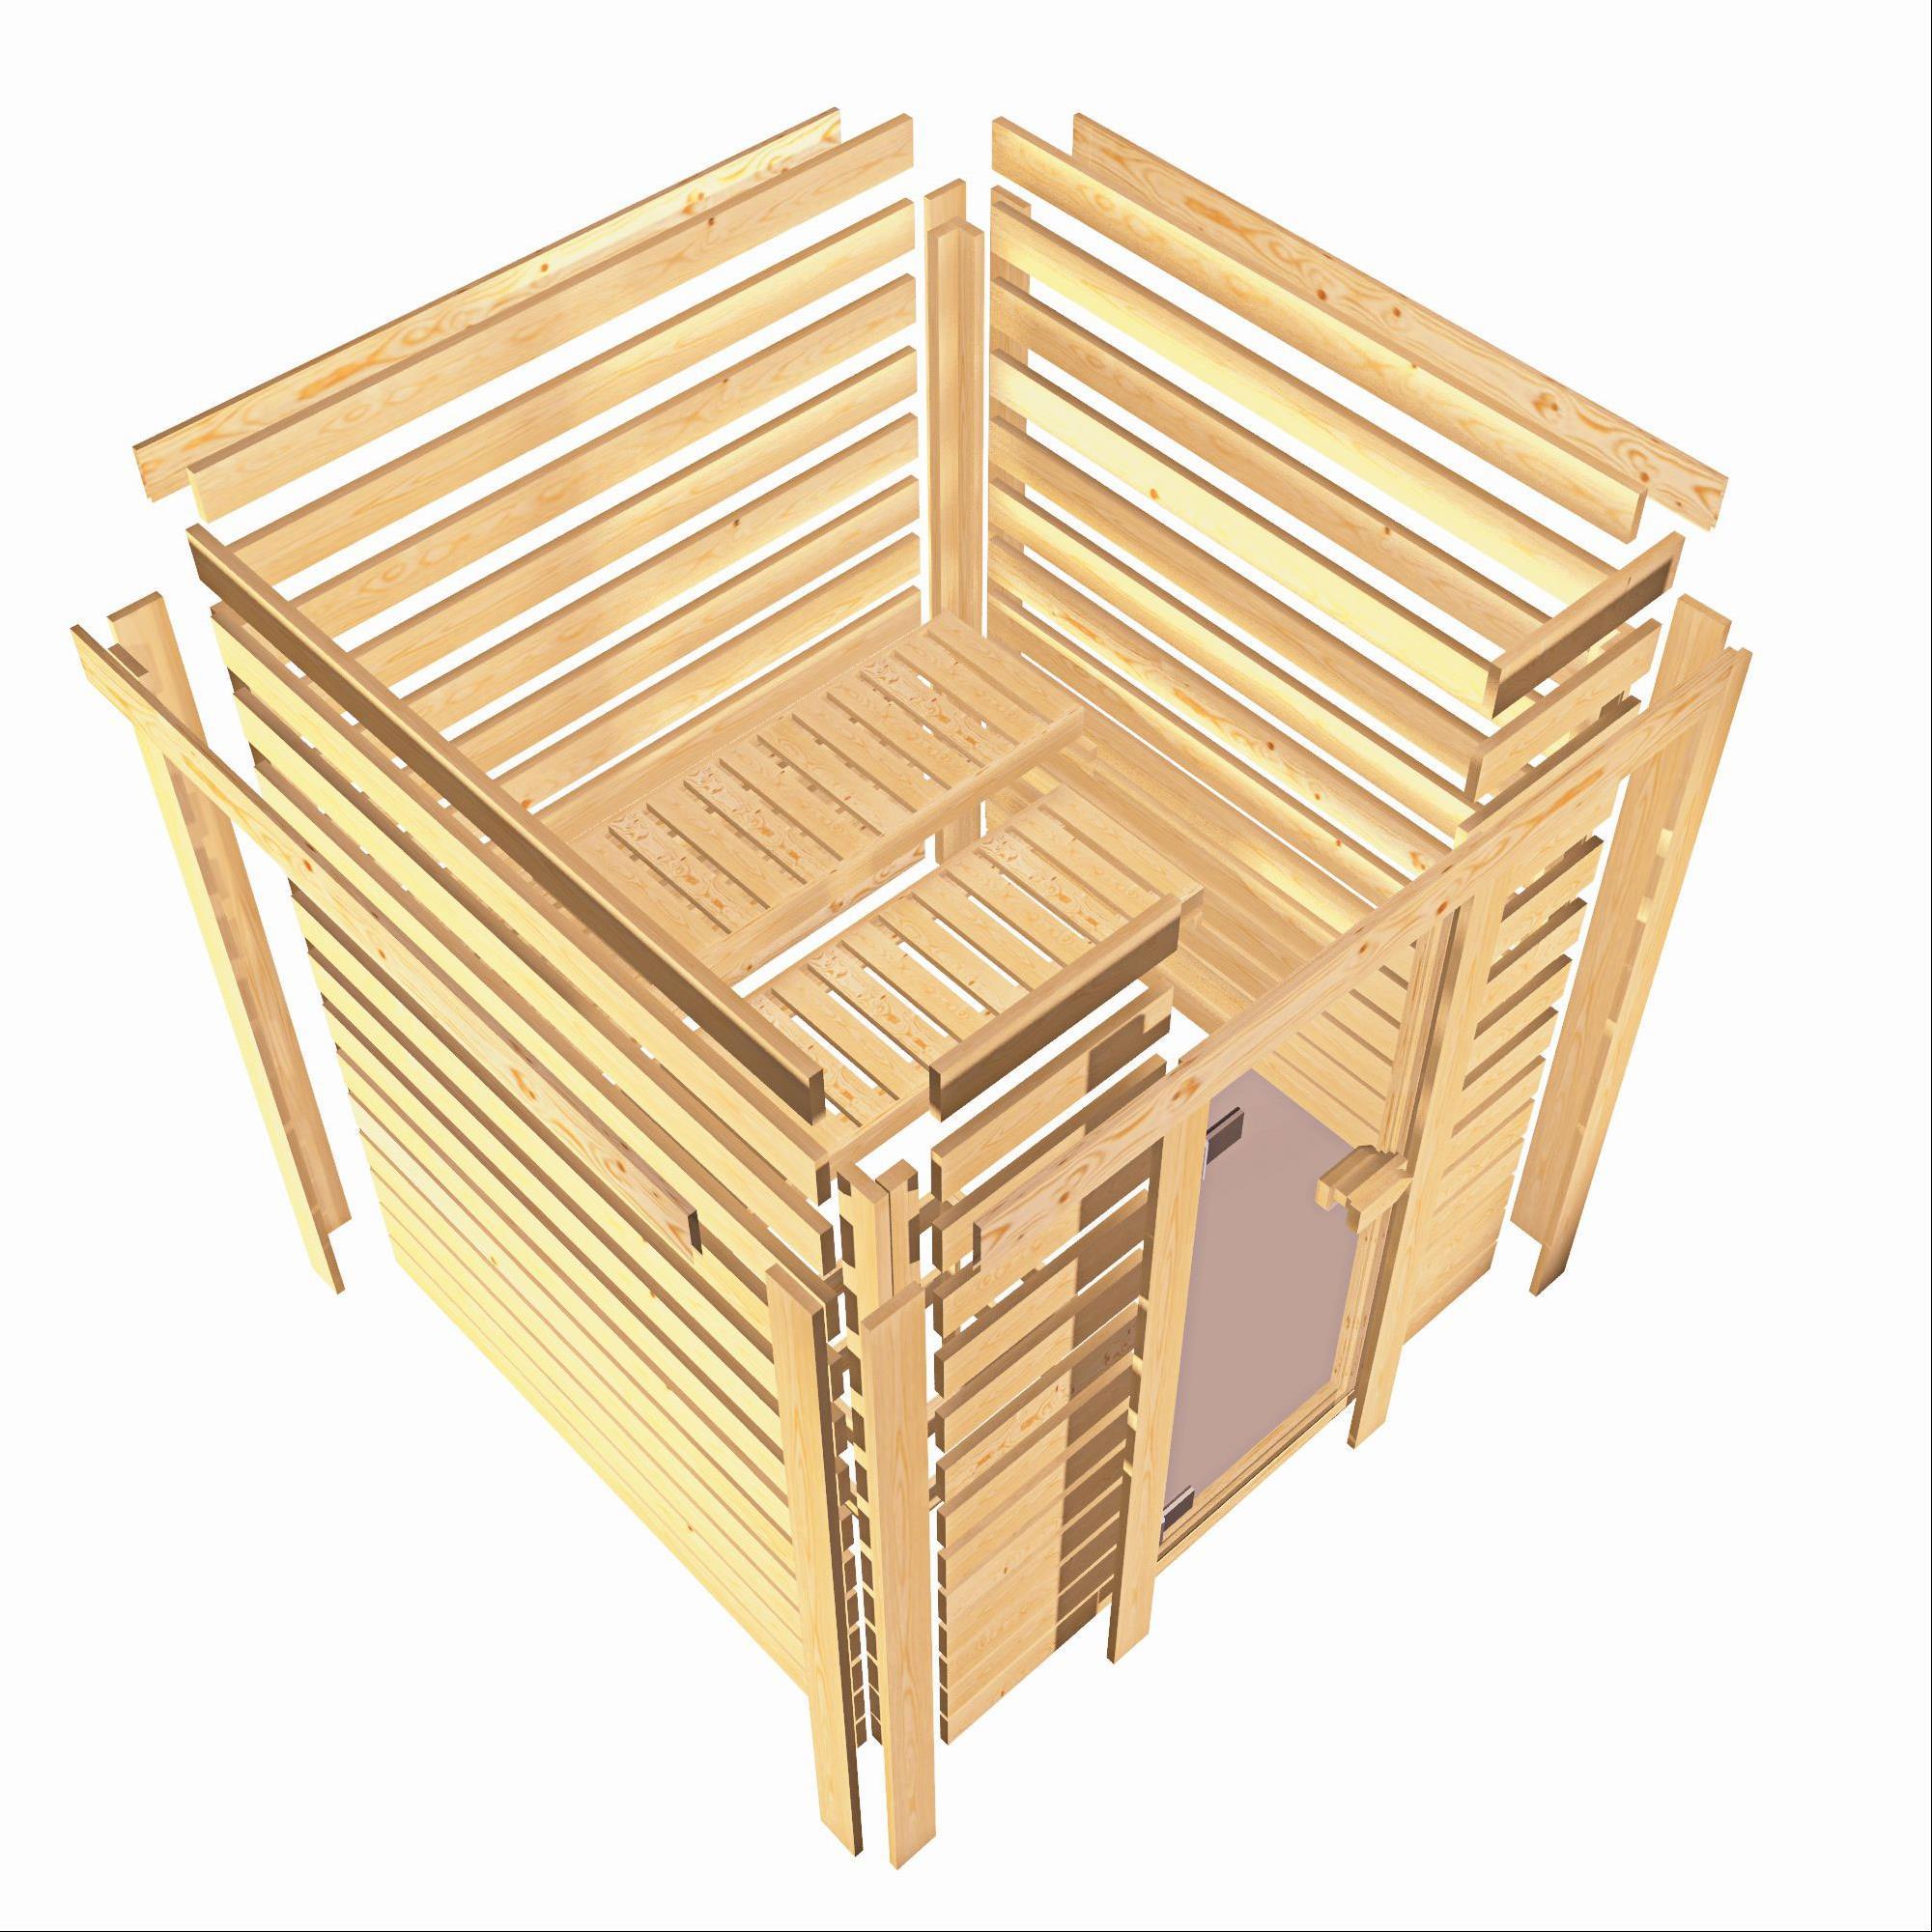 Woodfeeling Sauna Svenja 38mm mit Bio Saunaofen 9 kW extern Holztür Bild 4